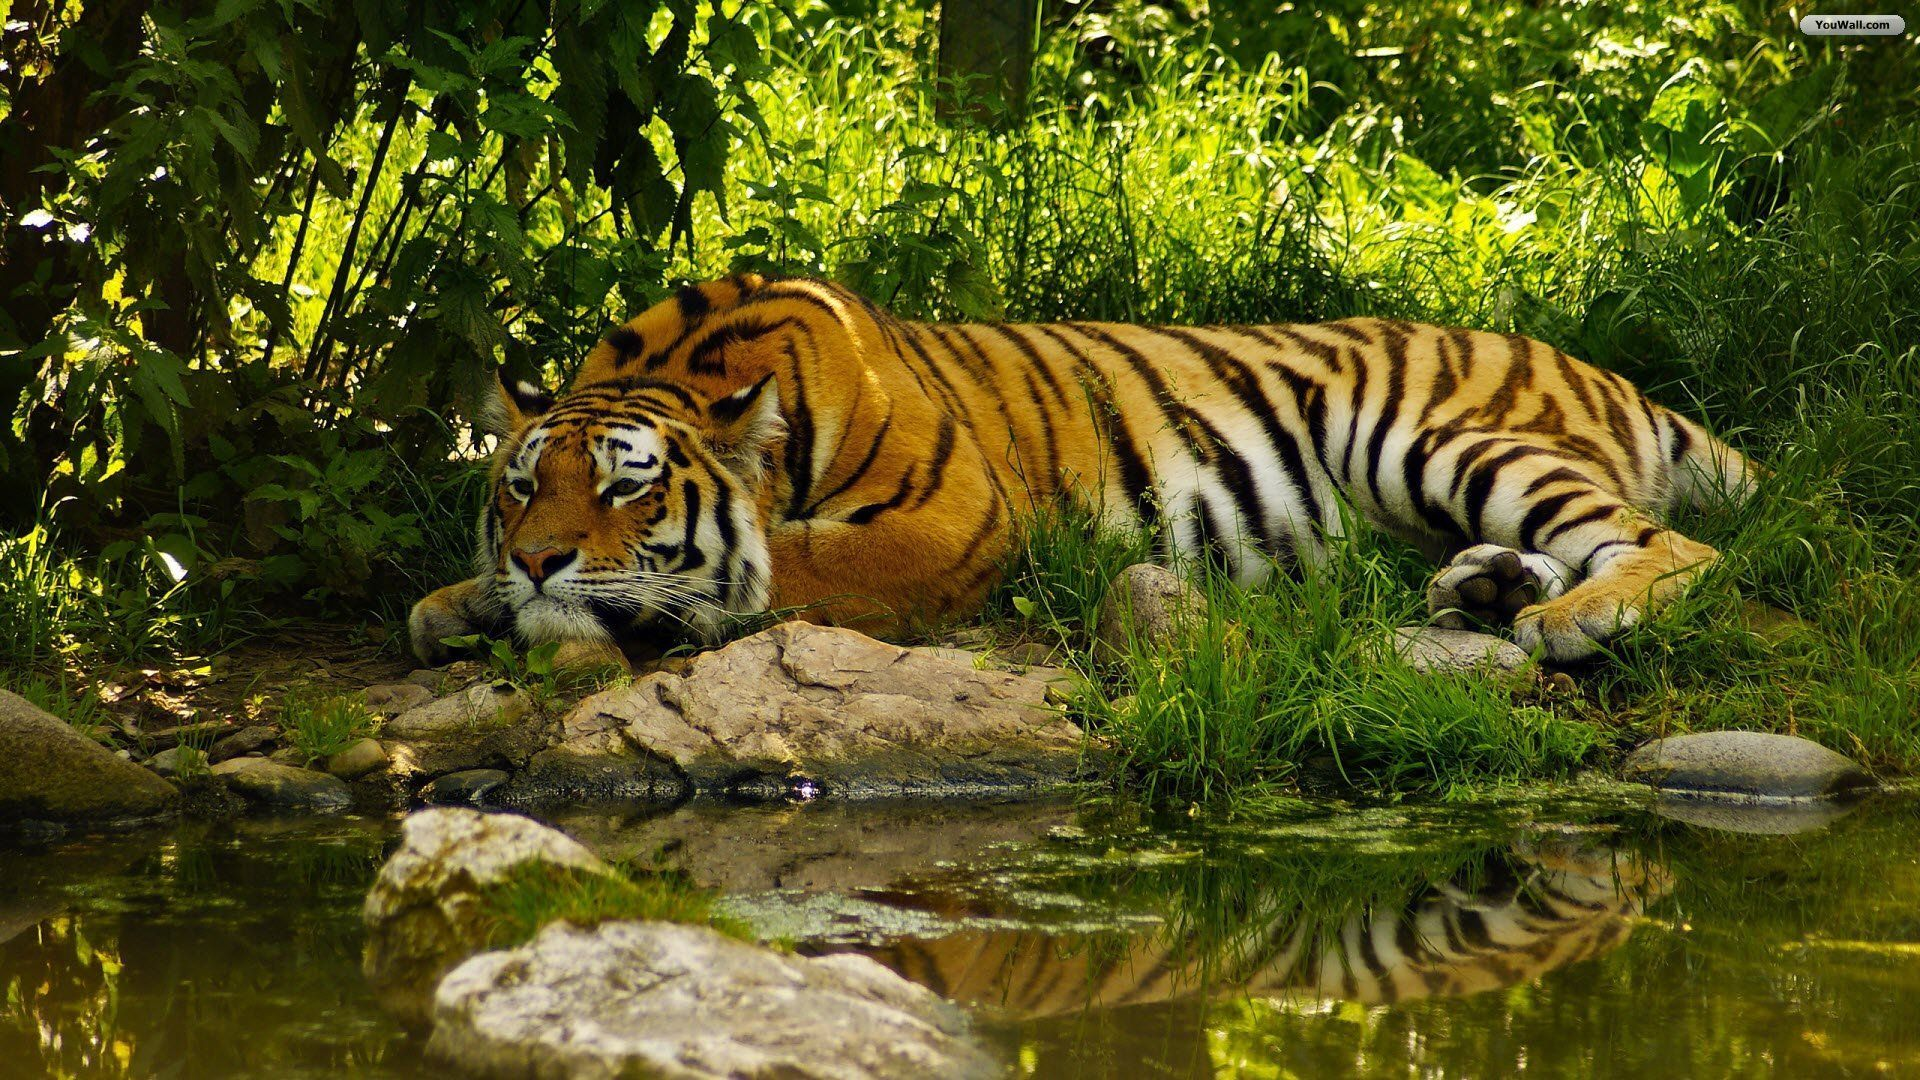 Tigers 2016 Widescreen